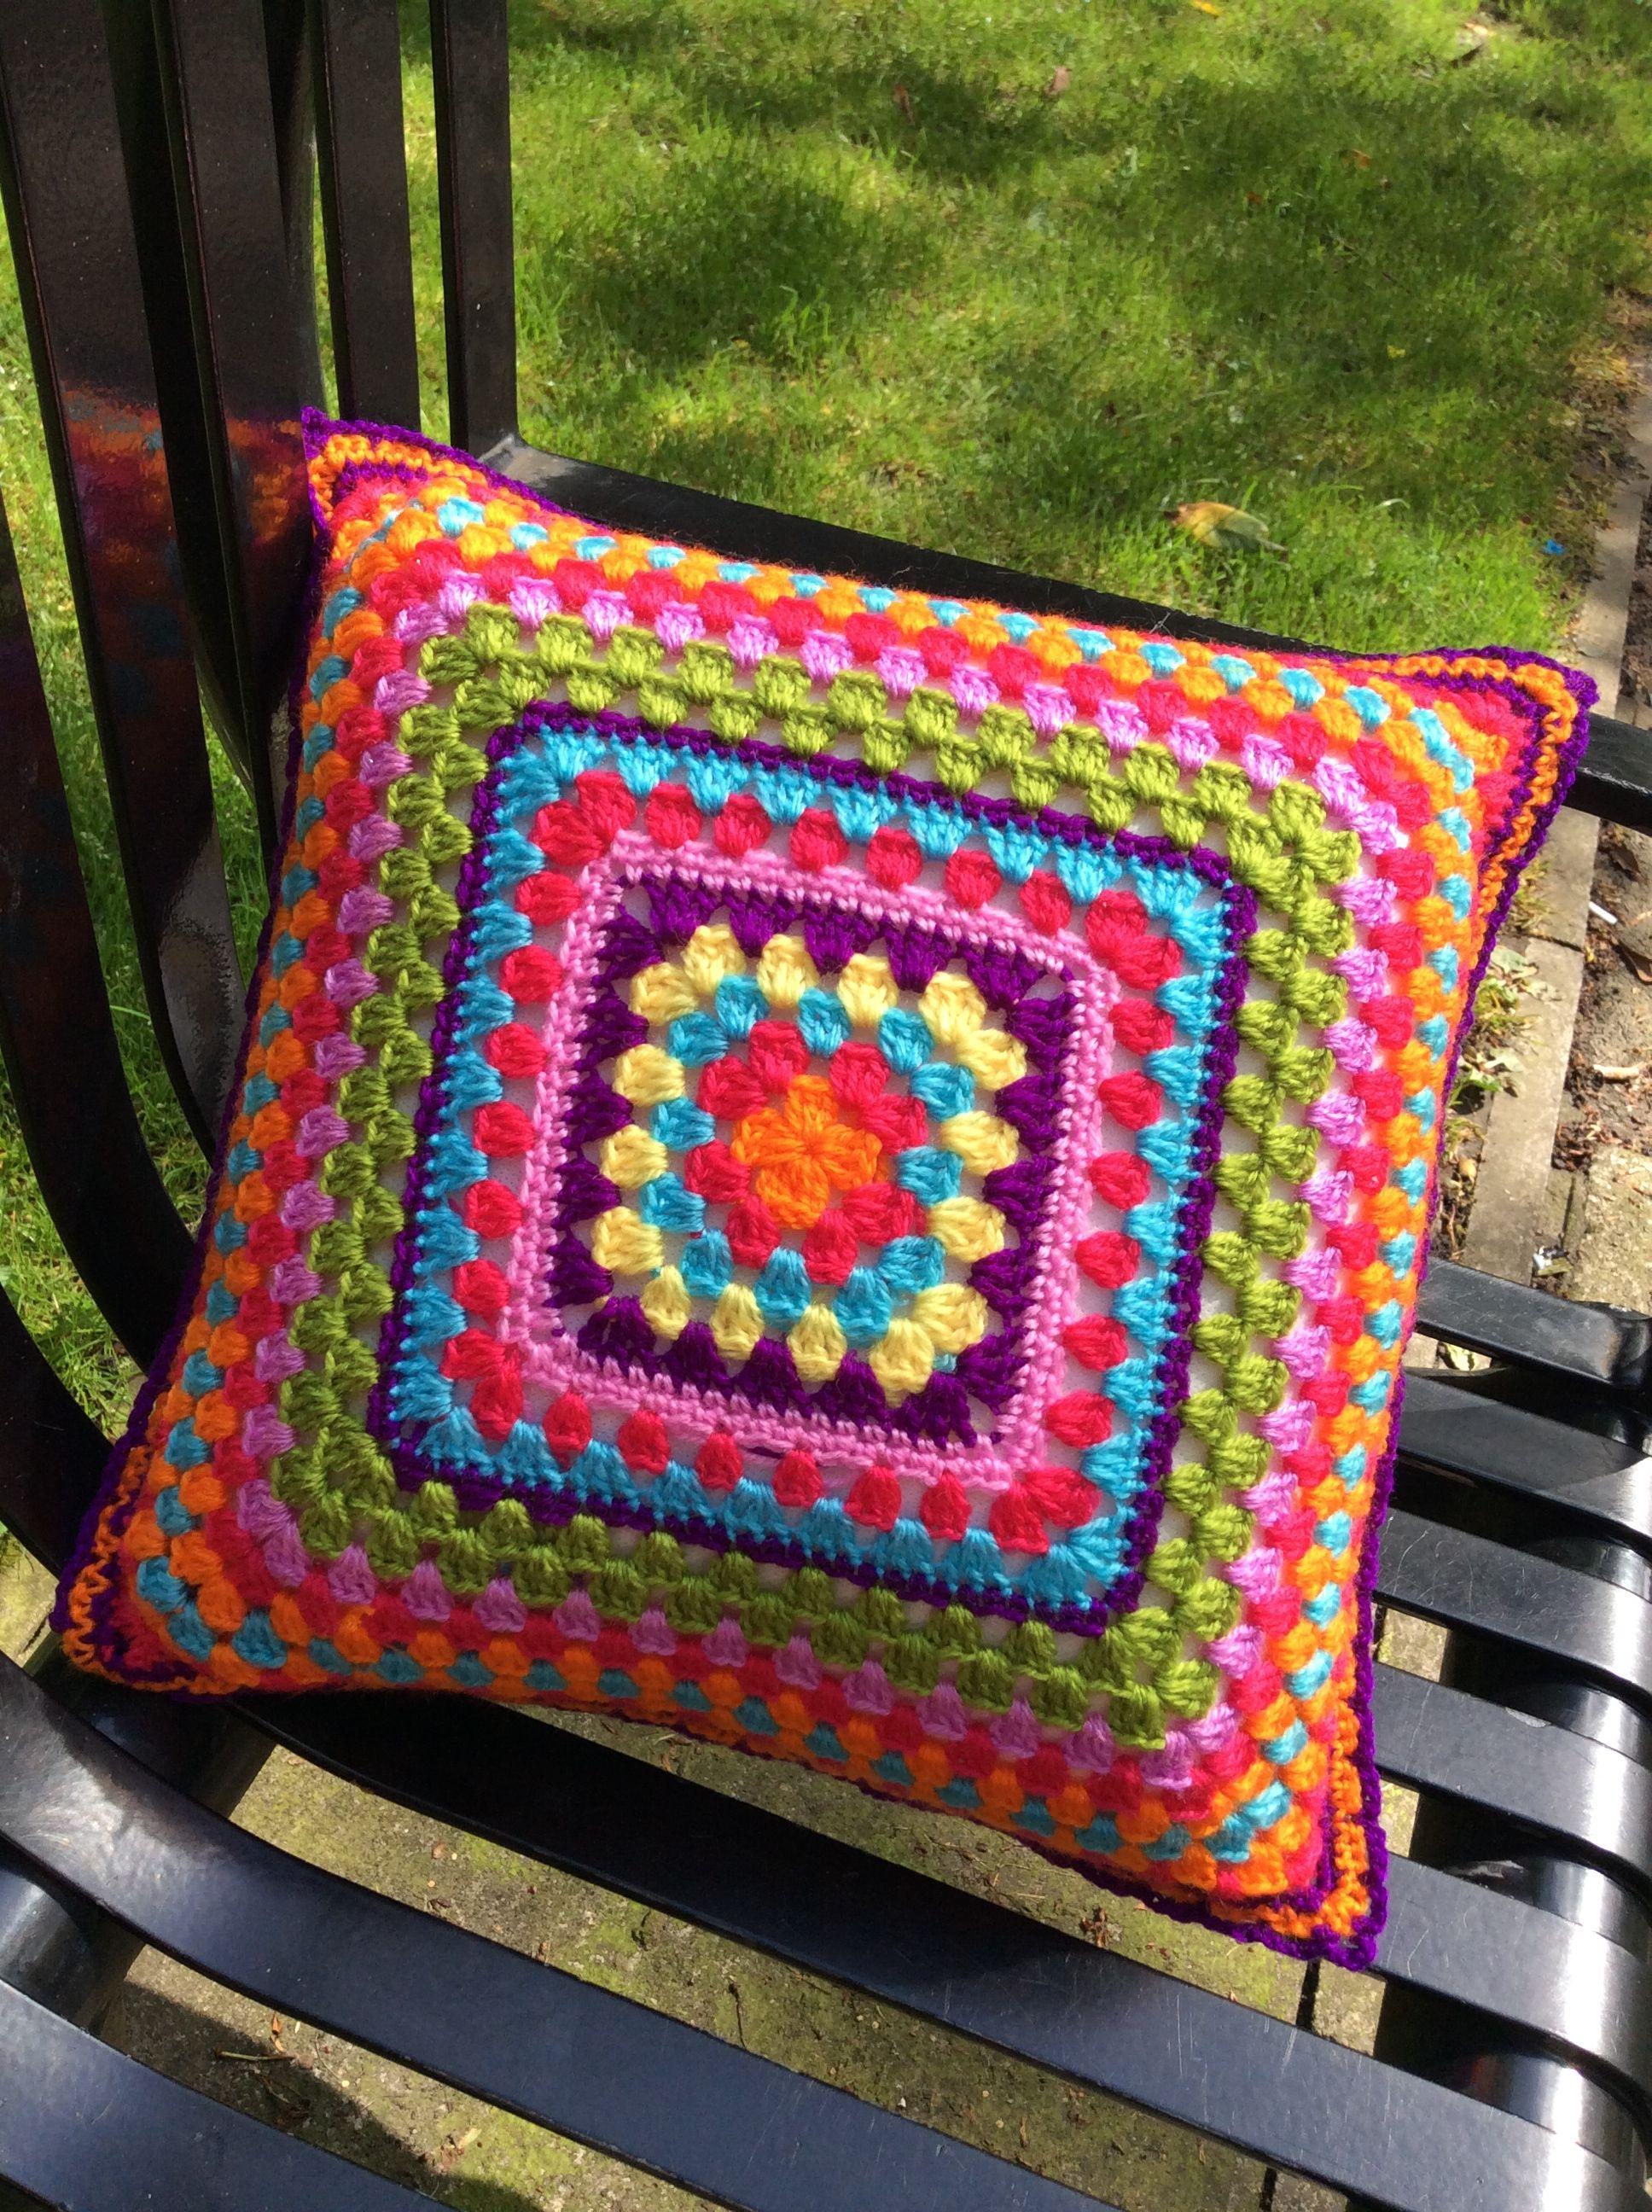 Busco Mancunian Cushions | Gehaakte dekens en kussens | Pinterest ...